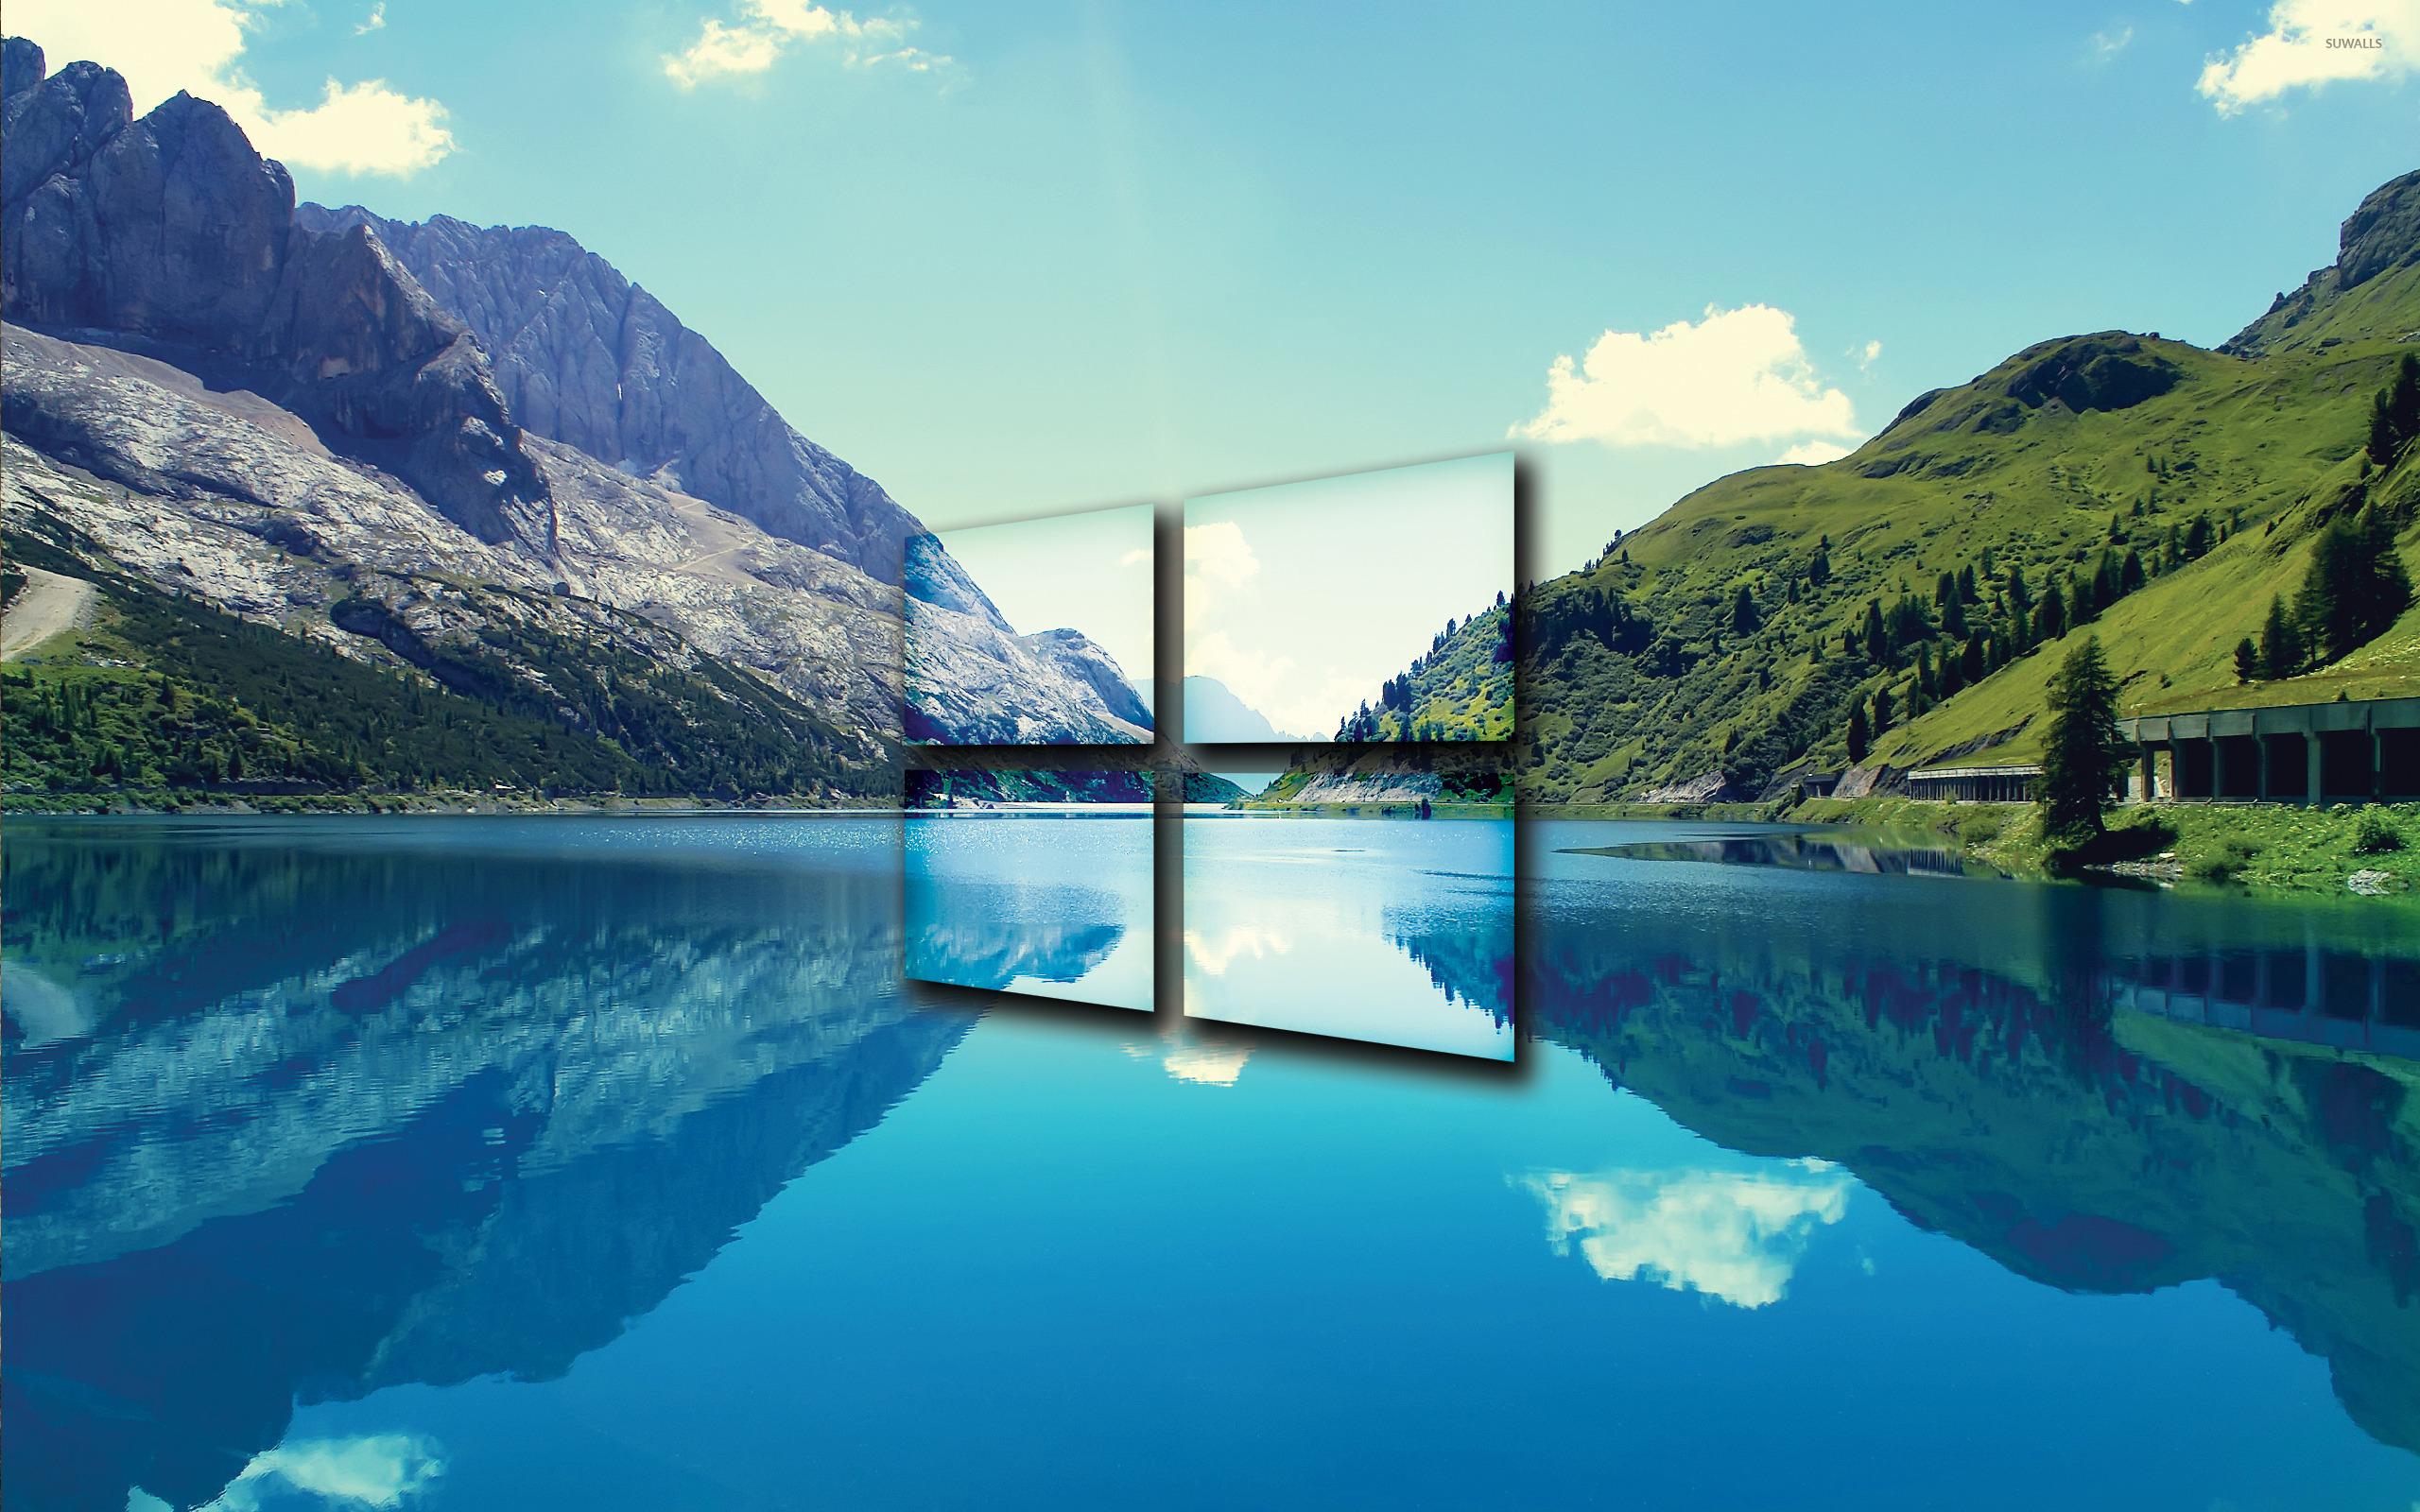 Windows 10 Wallpaper 1680x1050 - WallpaperSafari